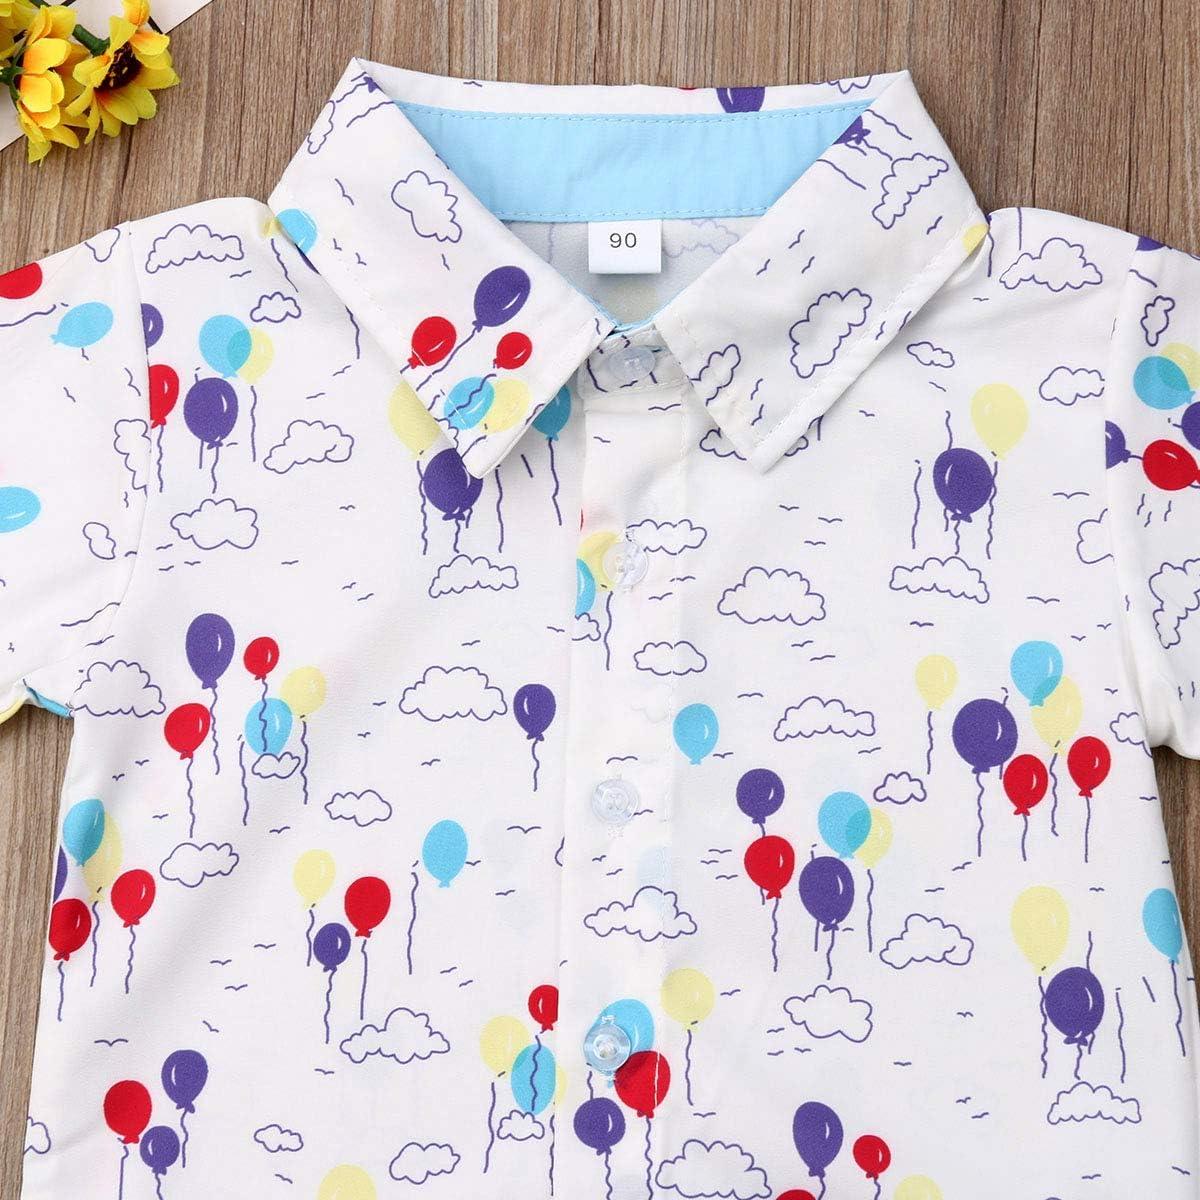 N //A Kids Toddler Baby Boys Suit Short Sleeve Balloon Printing Dress Shirt+Shorts Outfits 2Pcs Set Summer